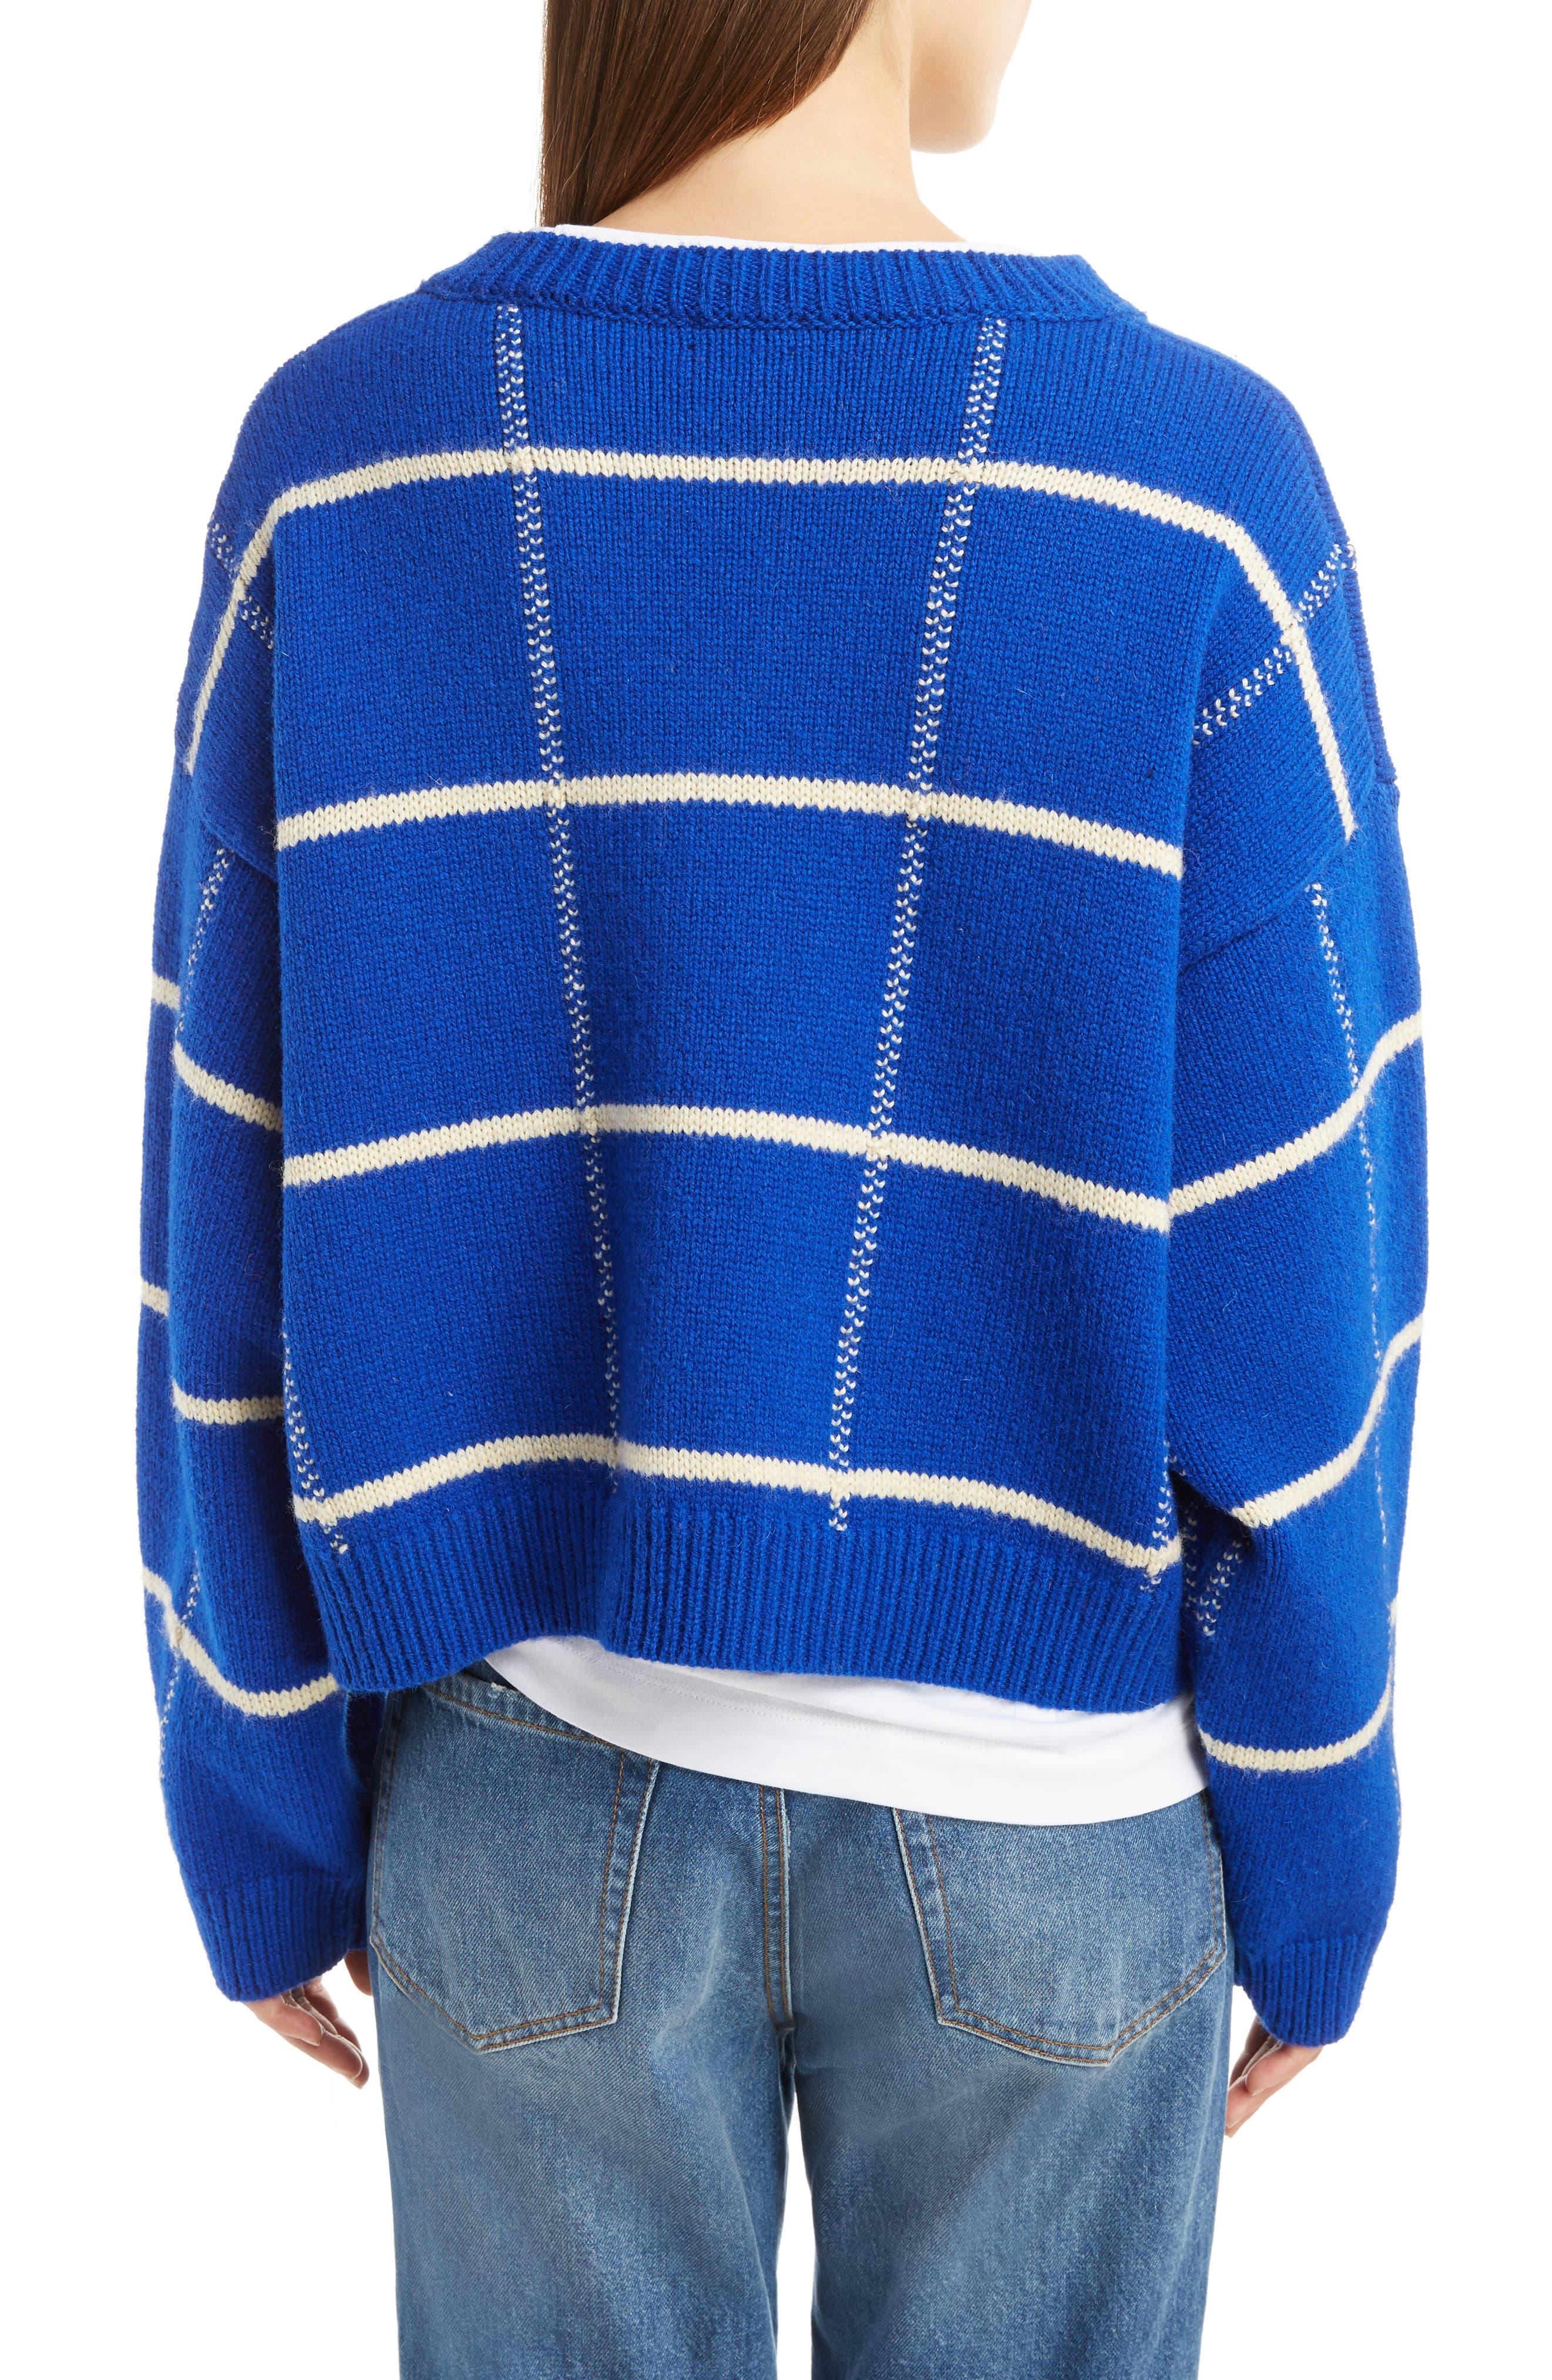 Windowpane Knit Wool Sweater,                             Alternate thumbnail 2, color,                             King Blue